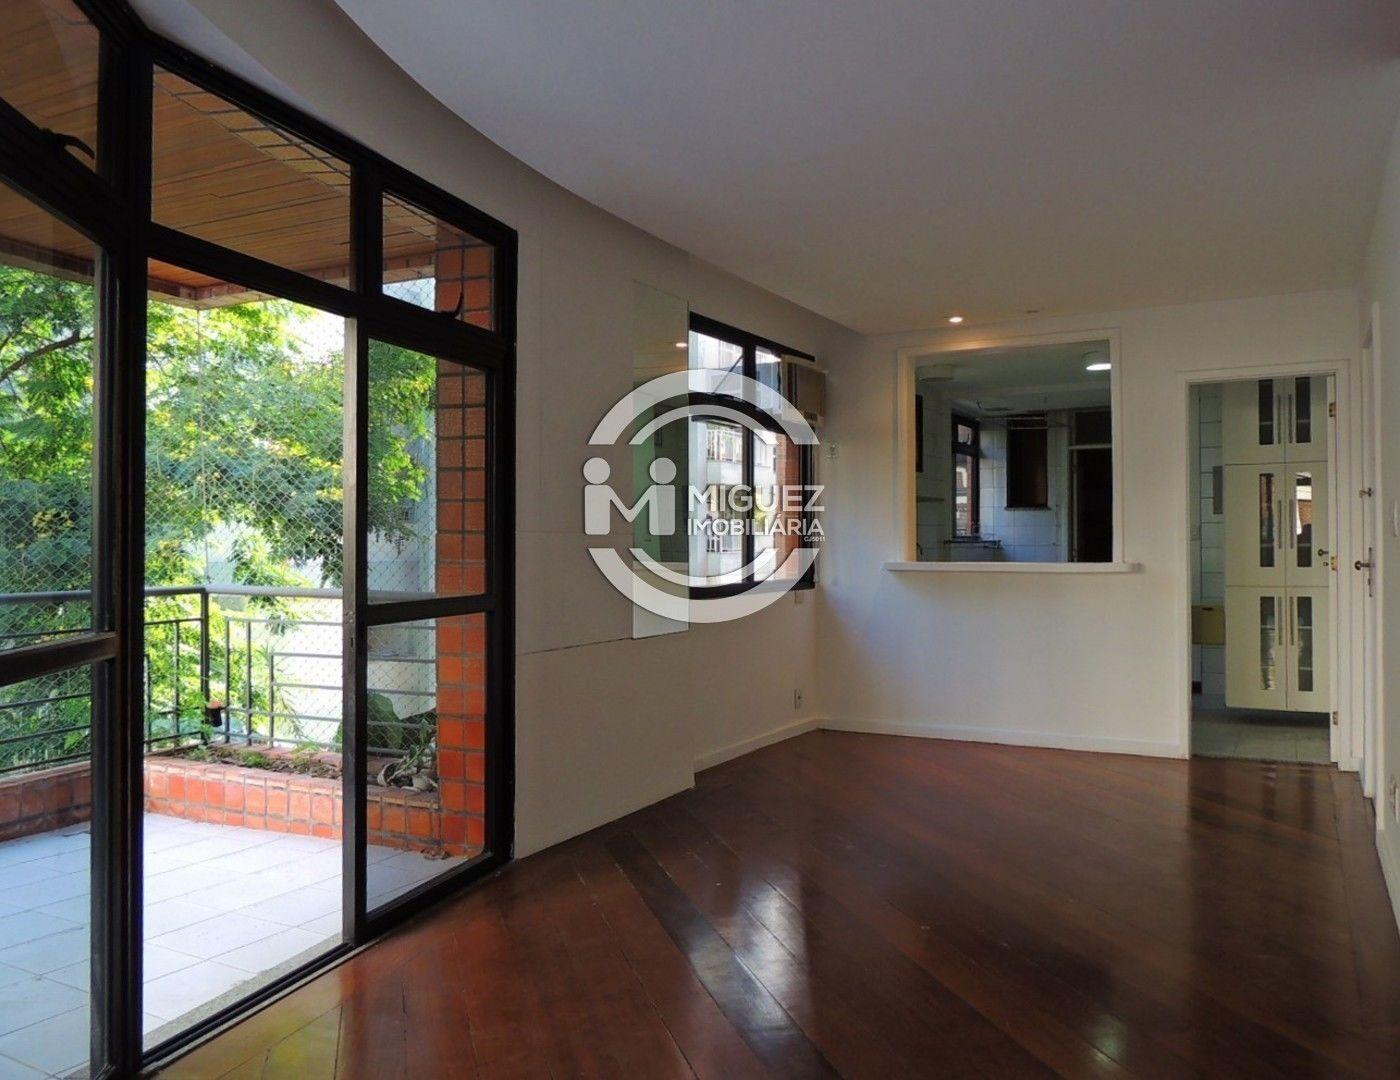 Apartamento, aluguel, Rua Baronesa de Pocone - Lagoa , Rio de janeiro